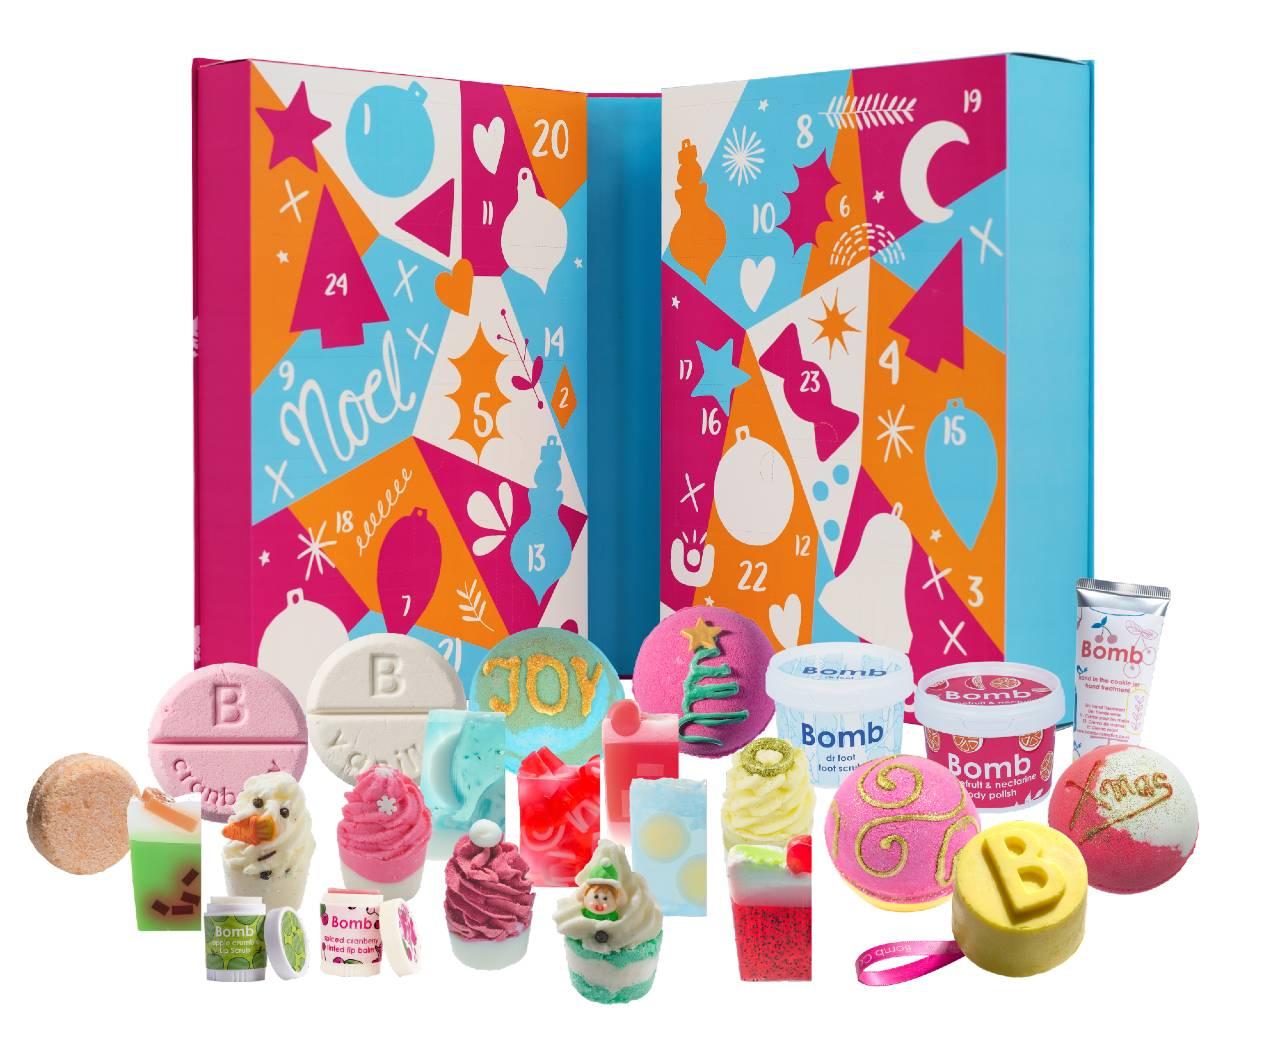 Tinsel My Fancy bomb cosmetics 2021